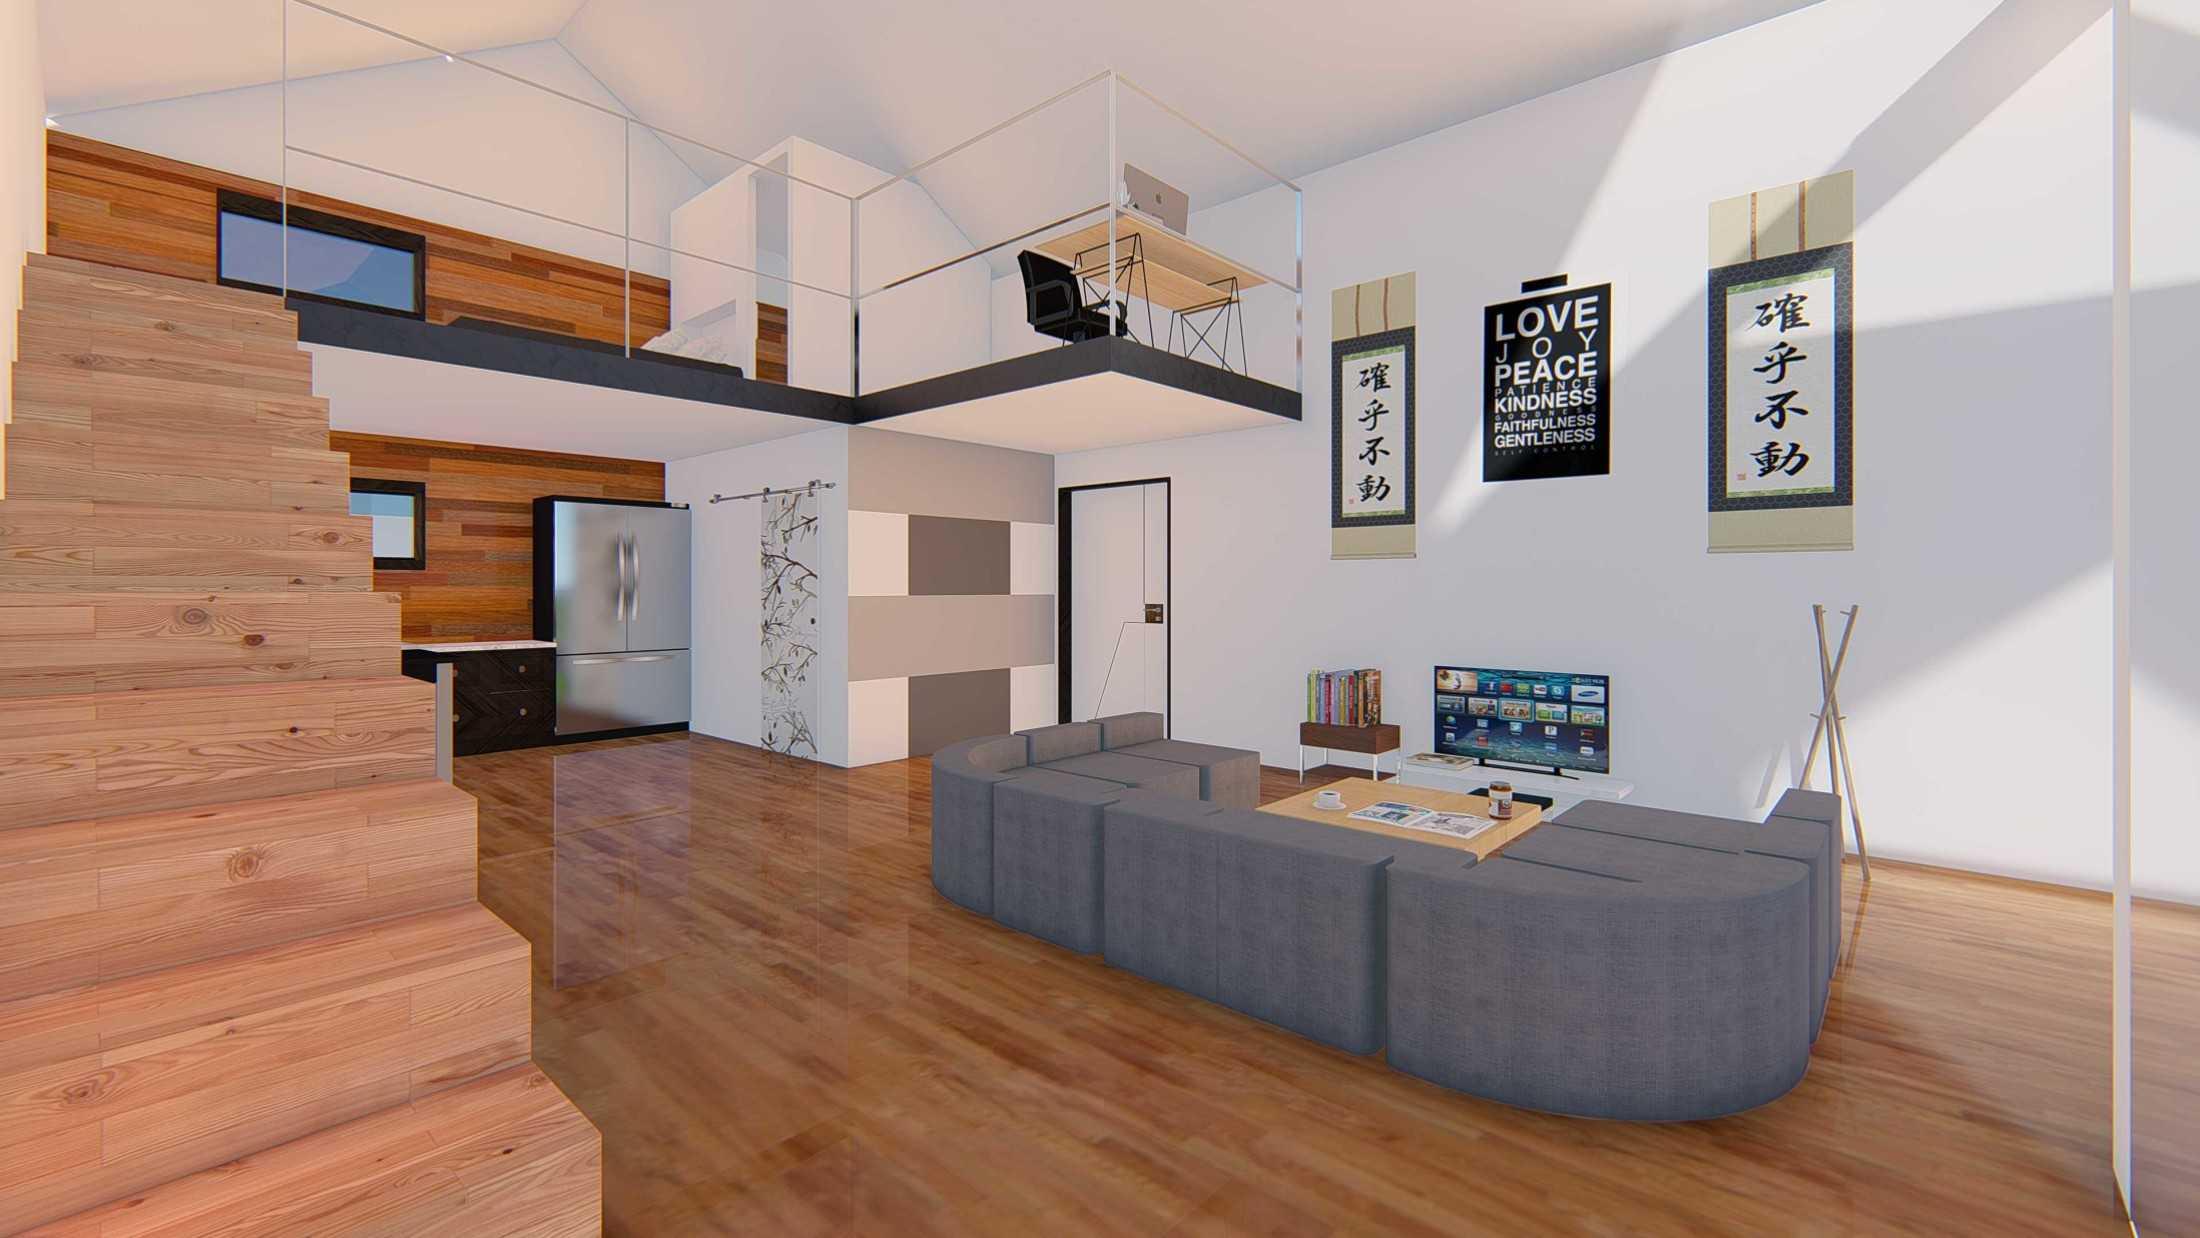 Rahmat Holiliy  Jm Apartment Berlin, Jerman Berlin, Jerman Rahmat-Holiliy-Jm-Apartment  57533